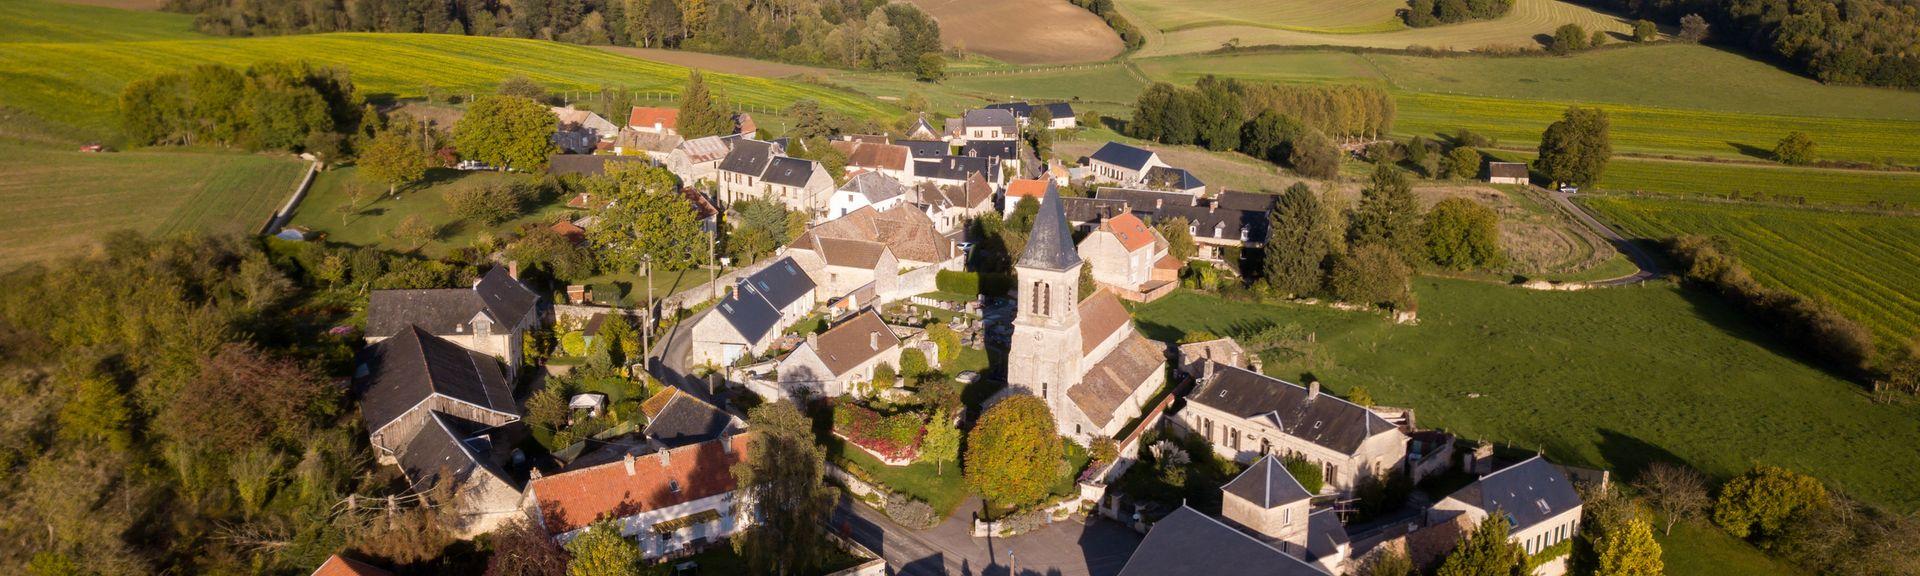 Chamouille, Aisne (department), France